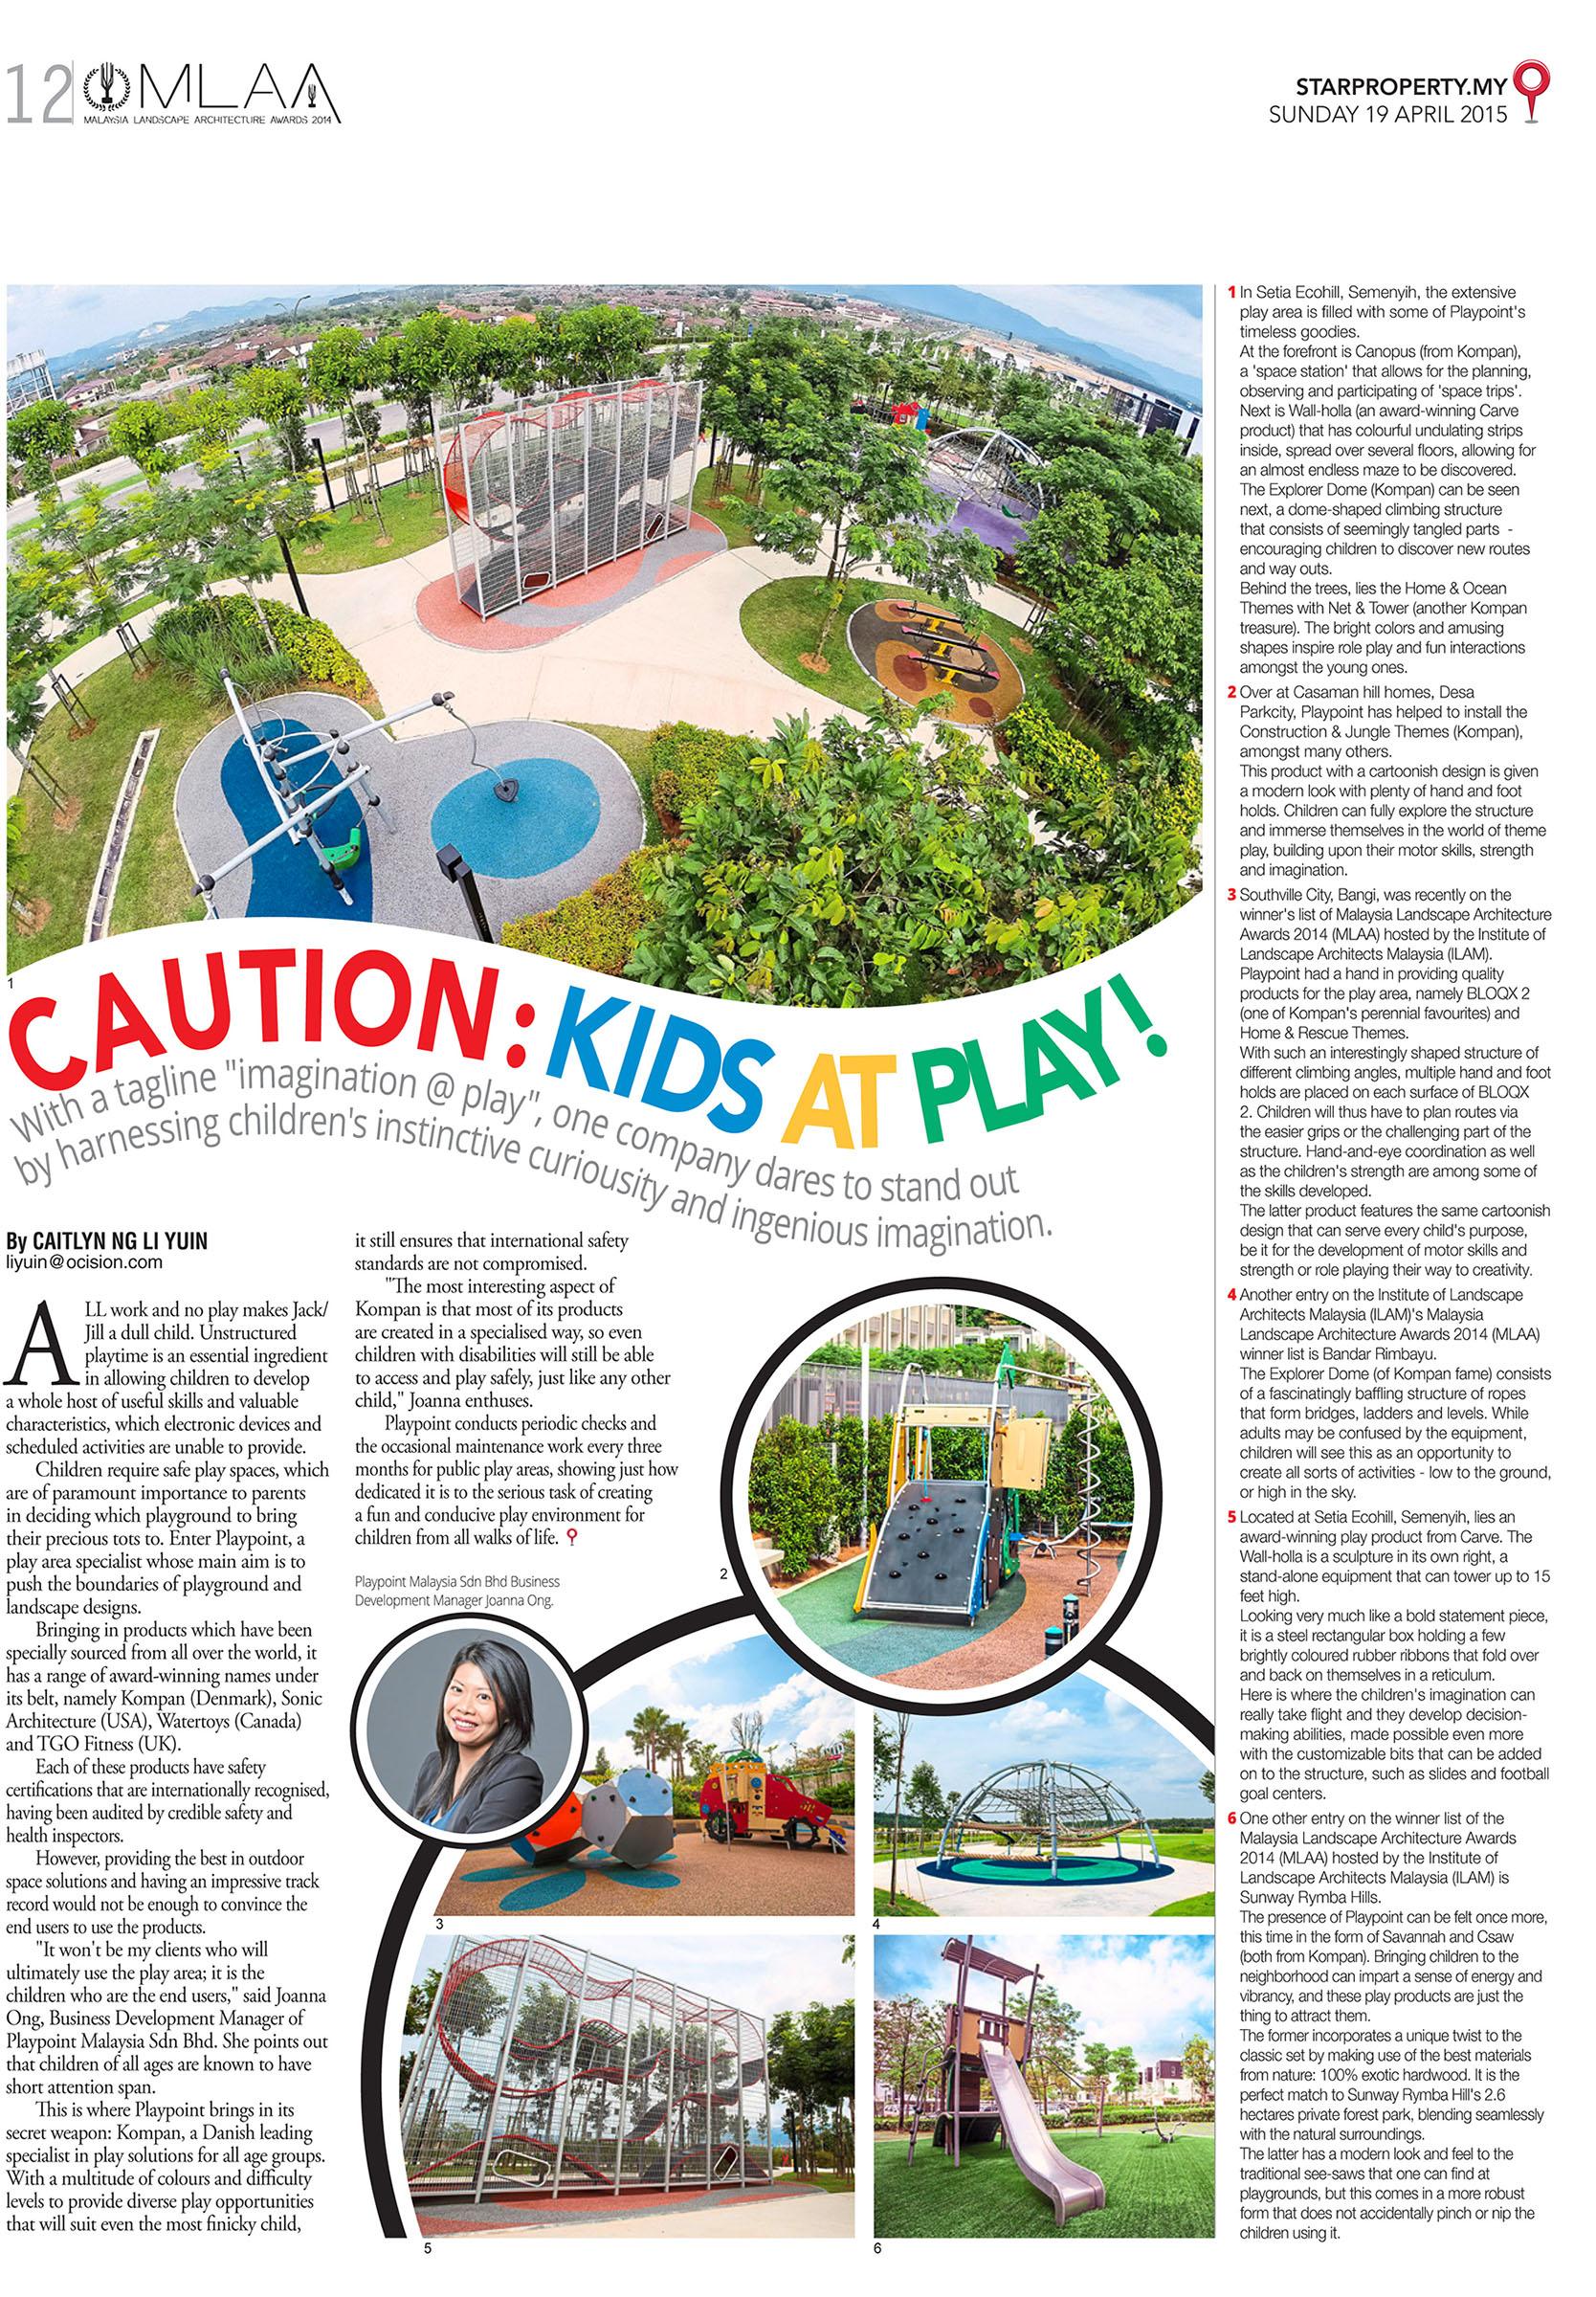 2015-04-19-Caution-Kids-At-Play.jpg